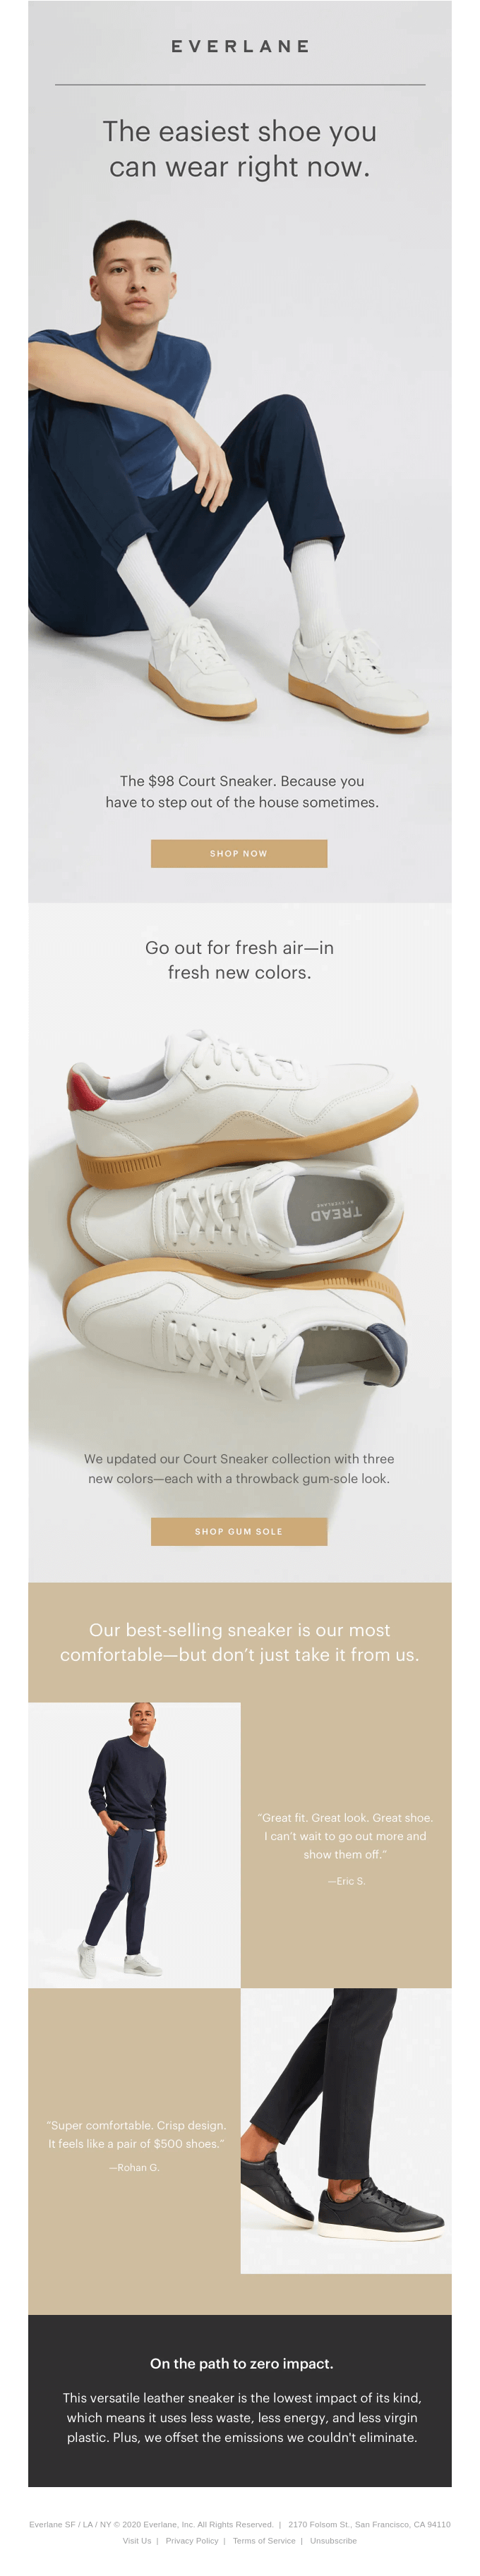 Meet our updated Court Sneaker.